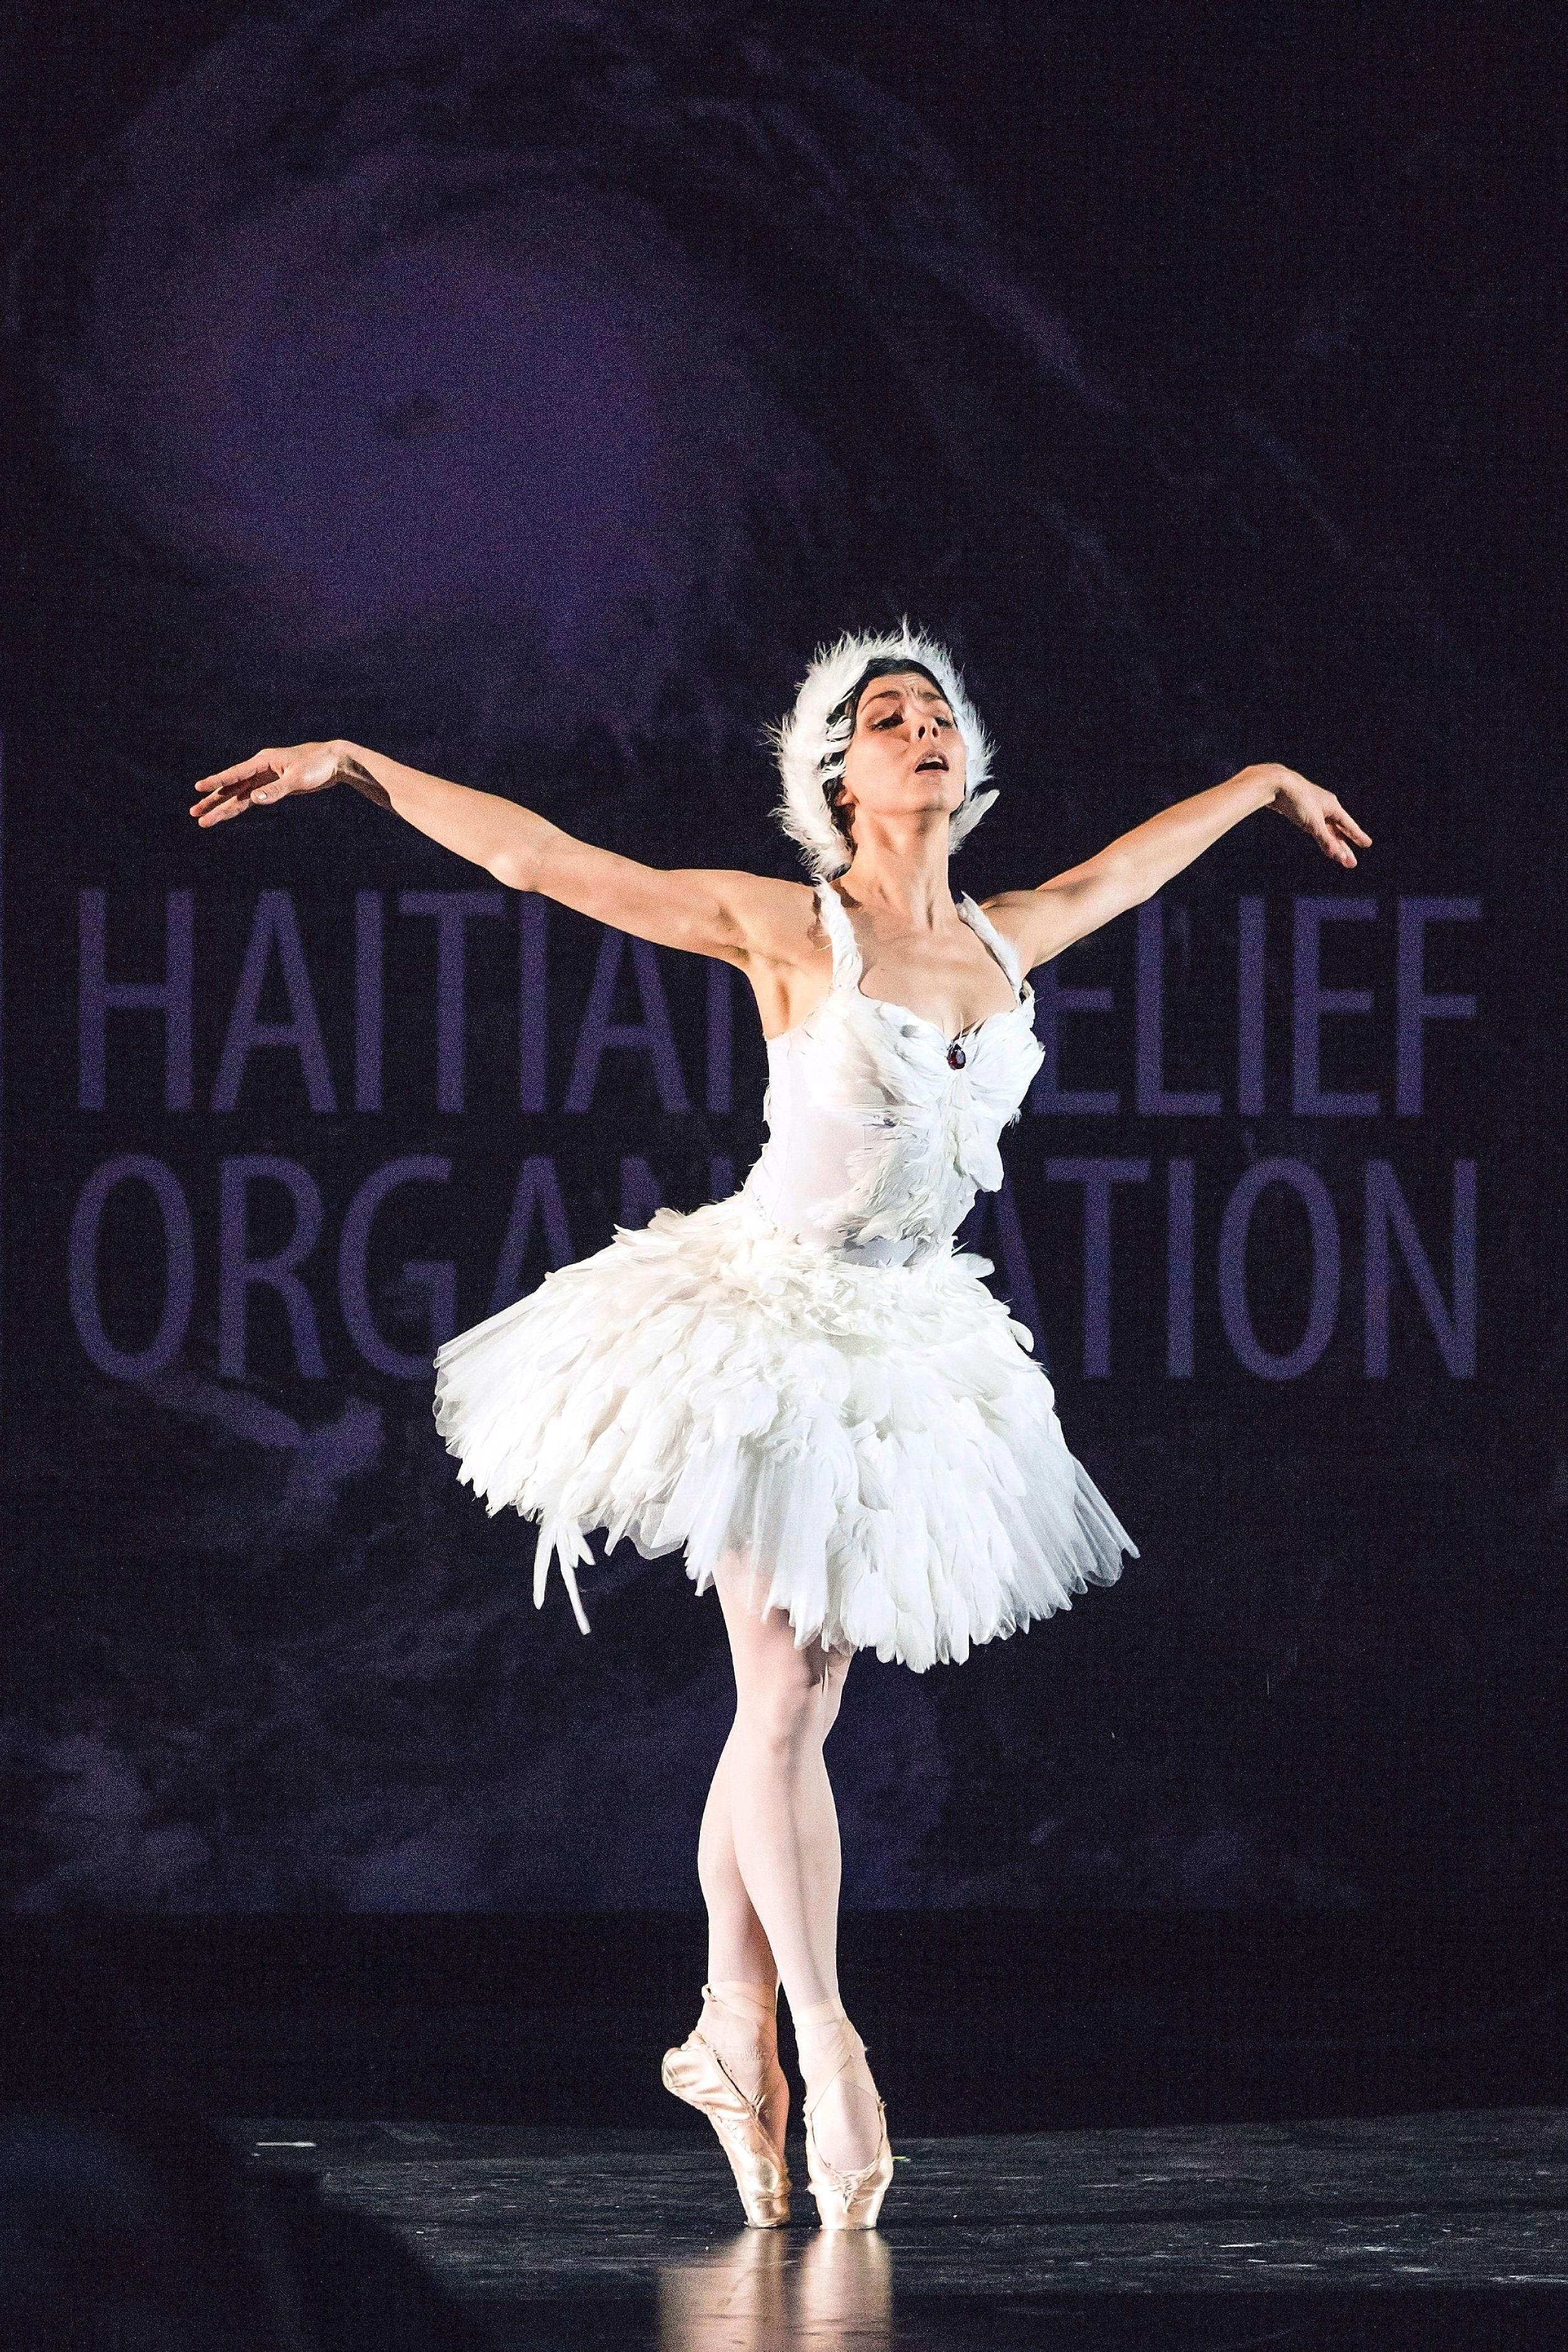 Ballet performer